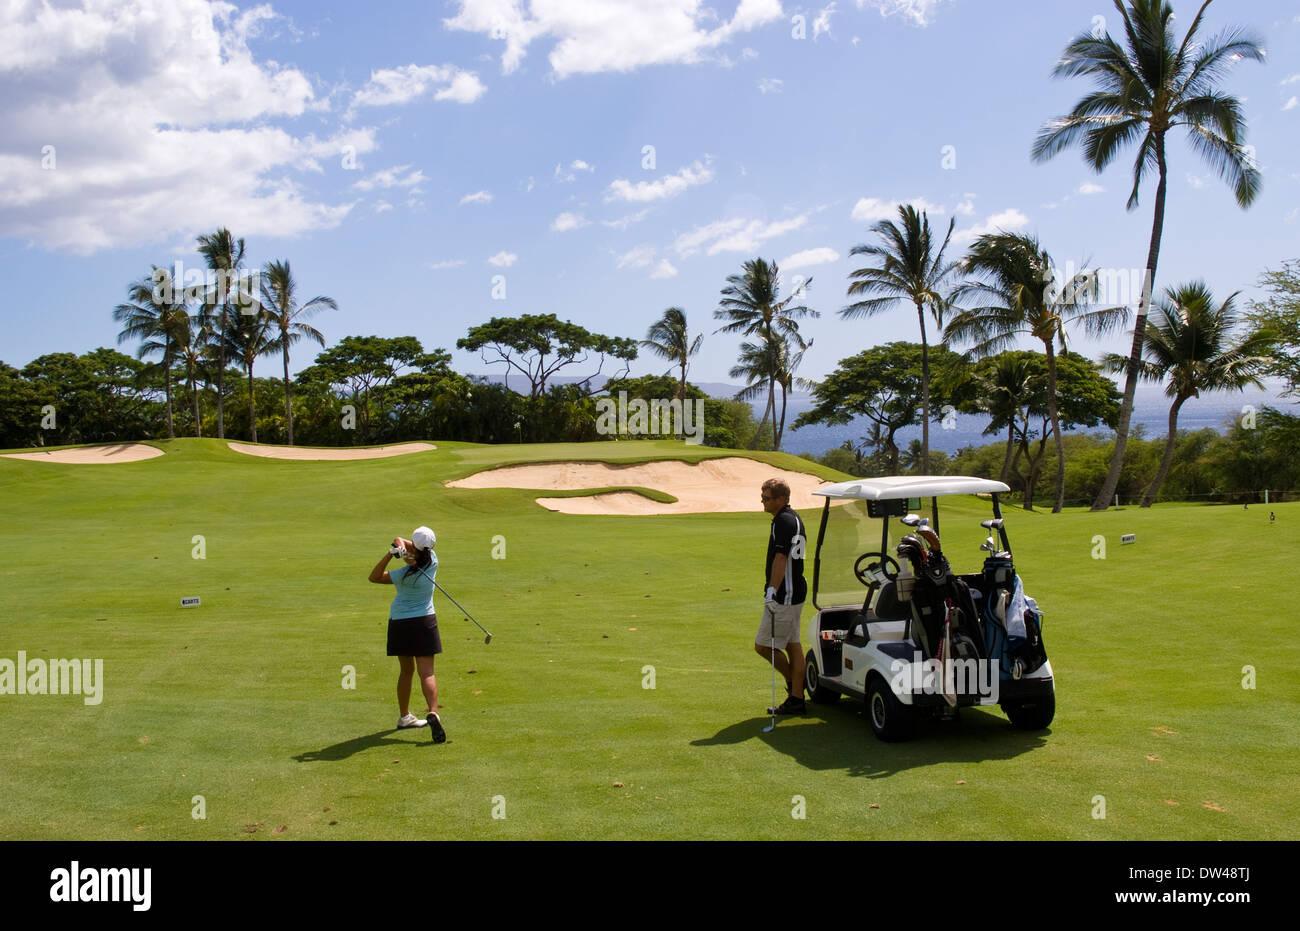 Golf Maui Hawaii Stock Photos Amp Golf Maui Hawaii Stock